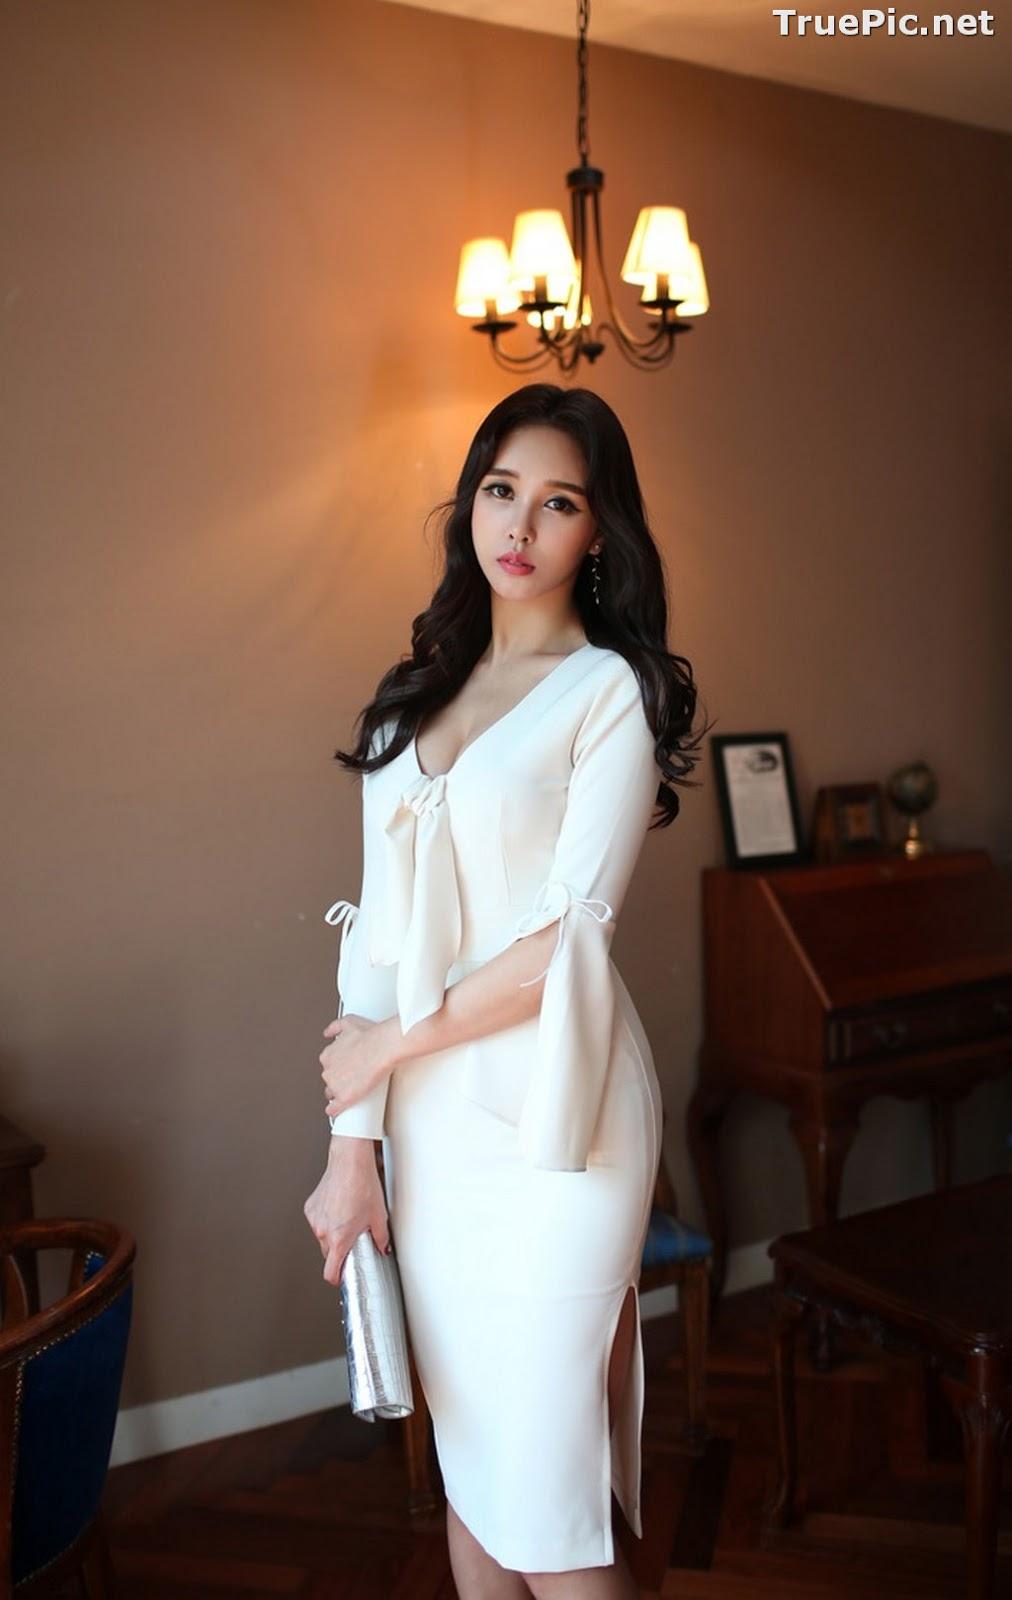 Image Korean Fashion Model - Chloe Kim - Fashion Photography Collection - TruePic.net - Picture-3